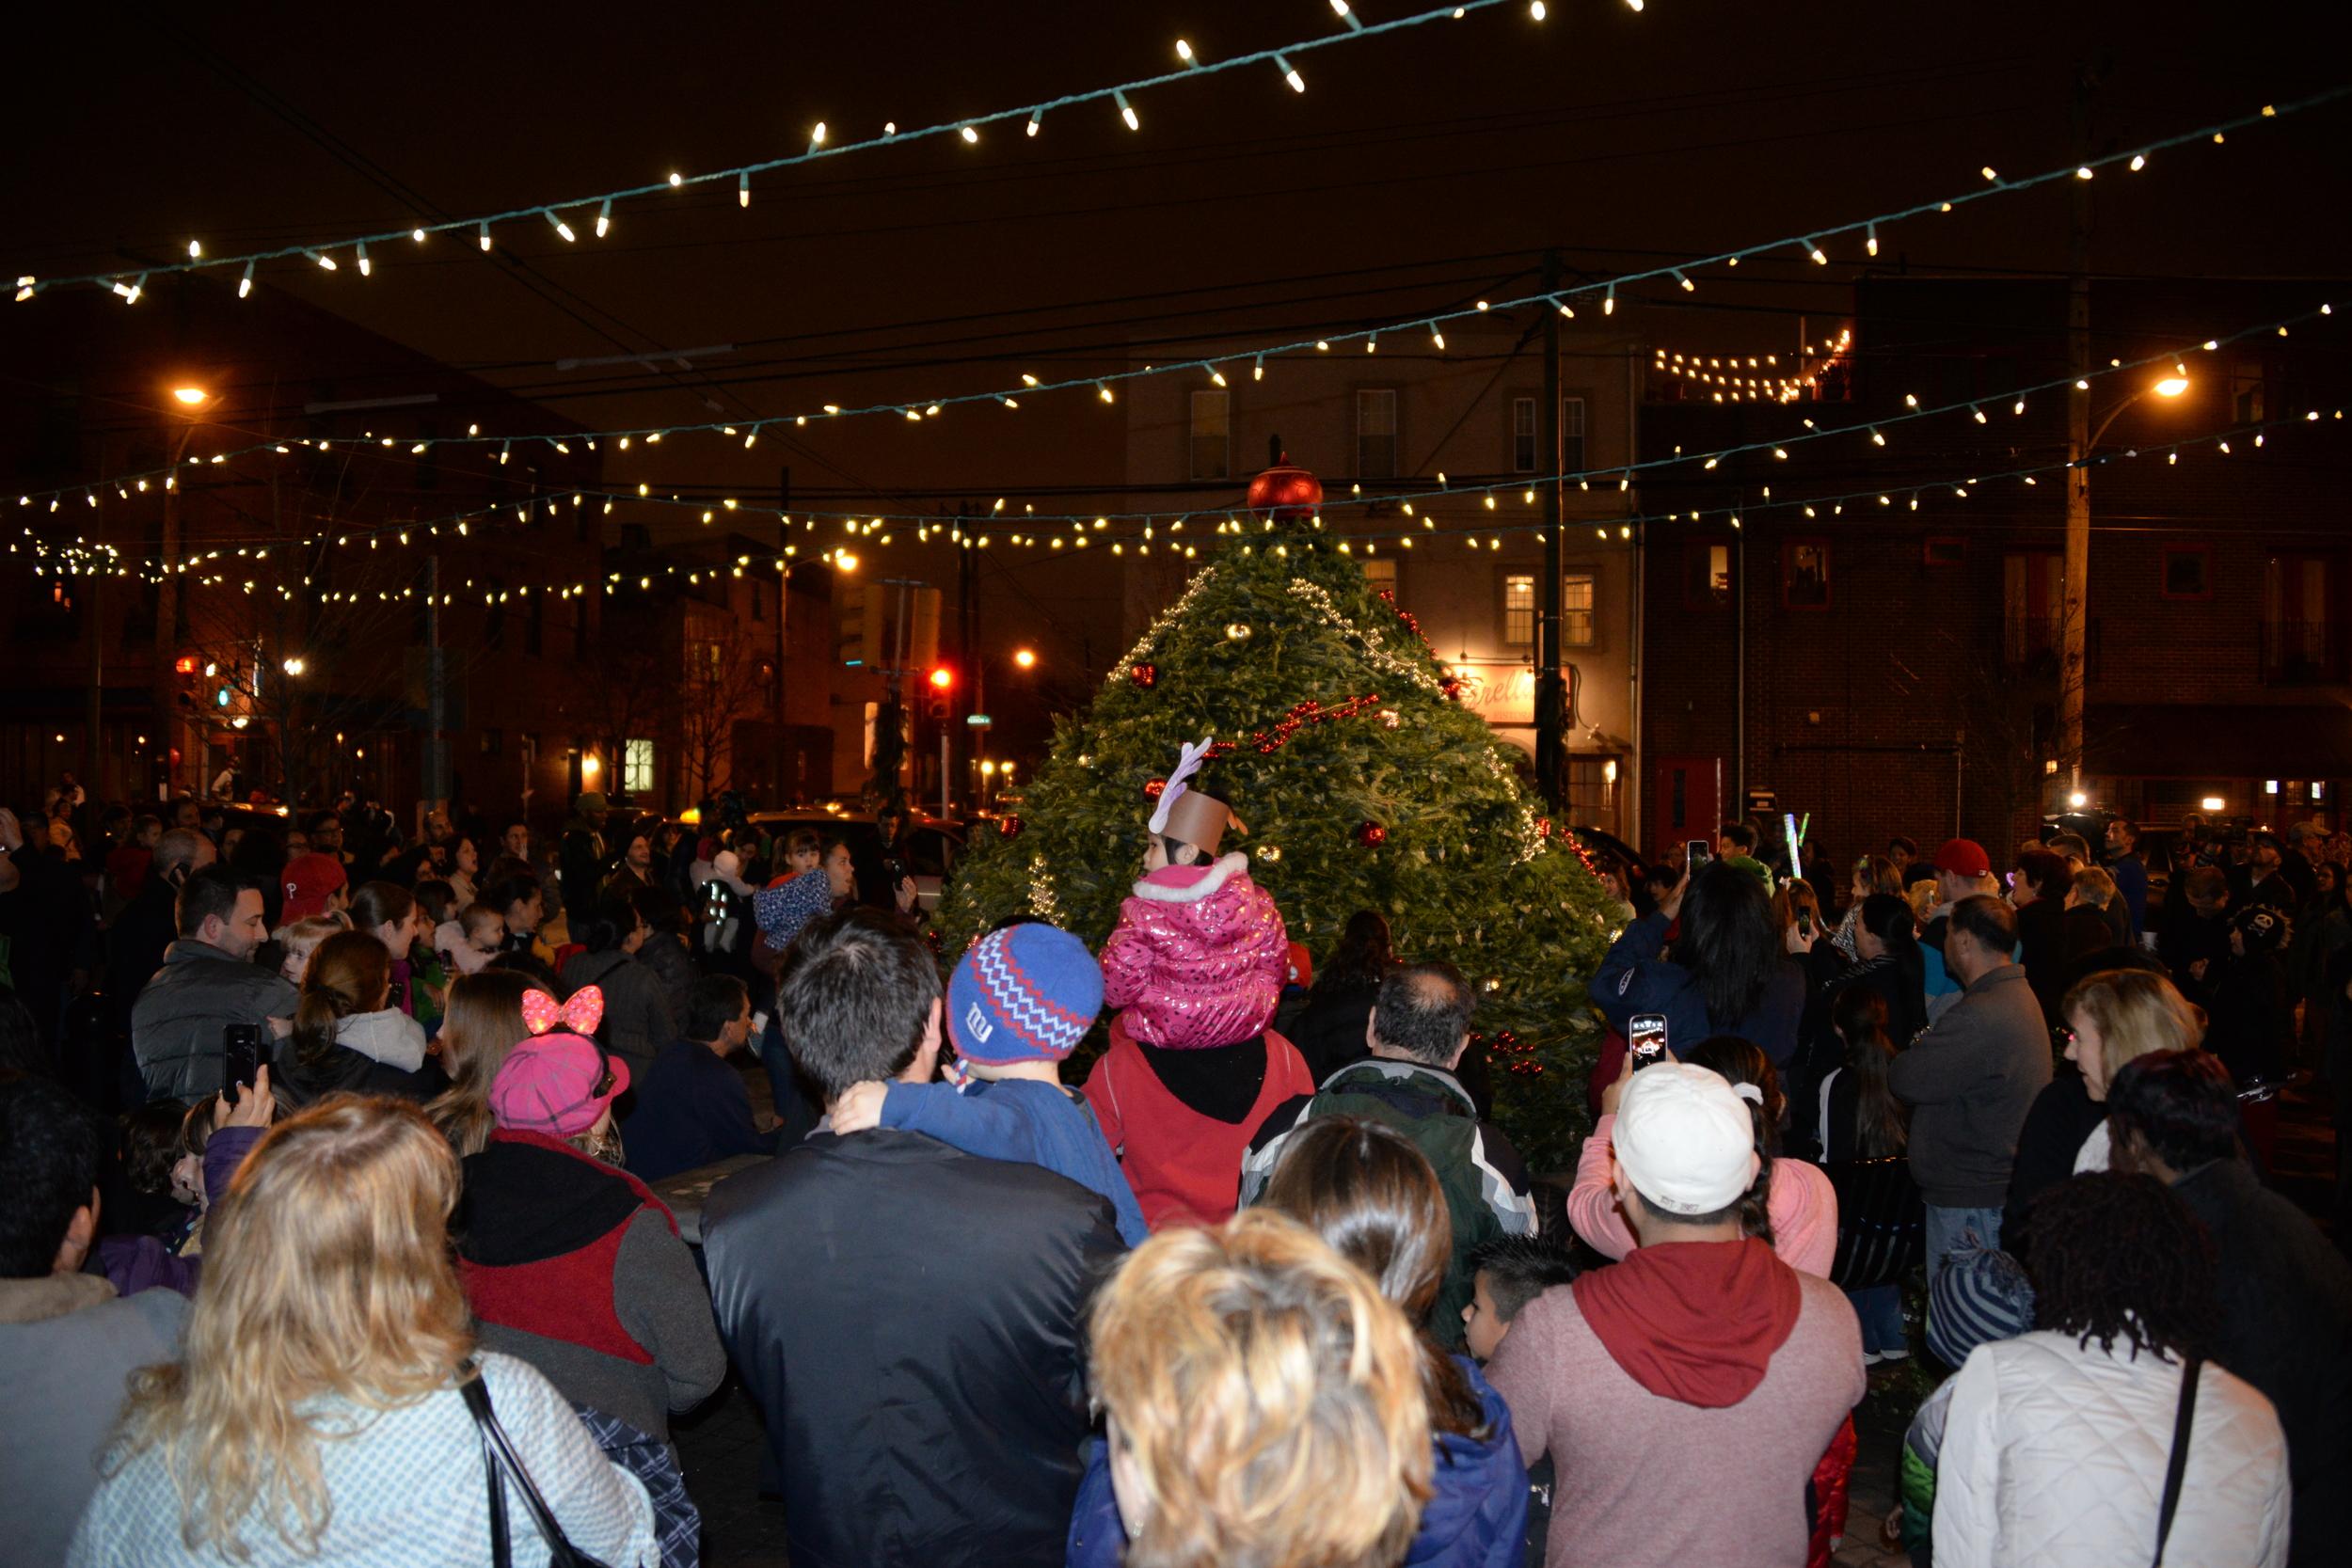 East Passyunk, Media Alert, Philadelphia, Tree Lighting